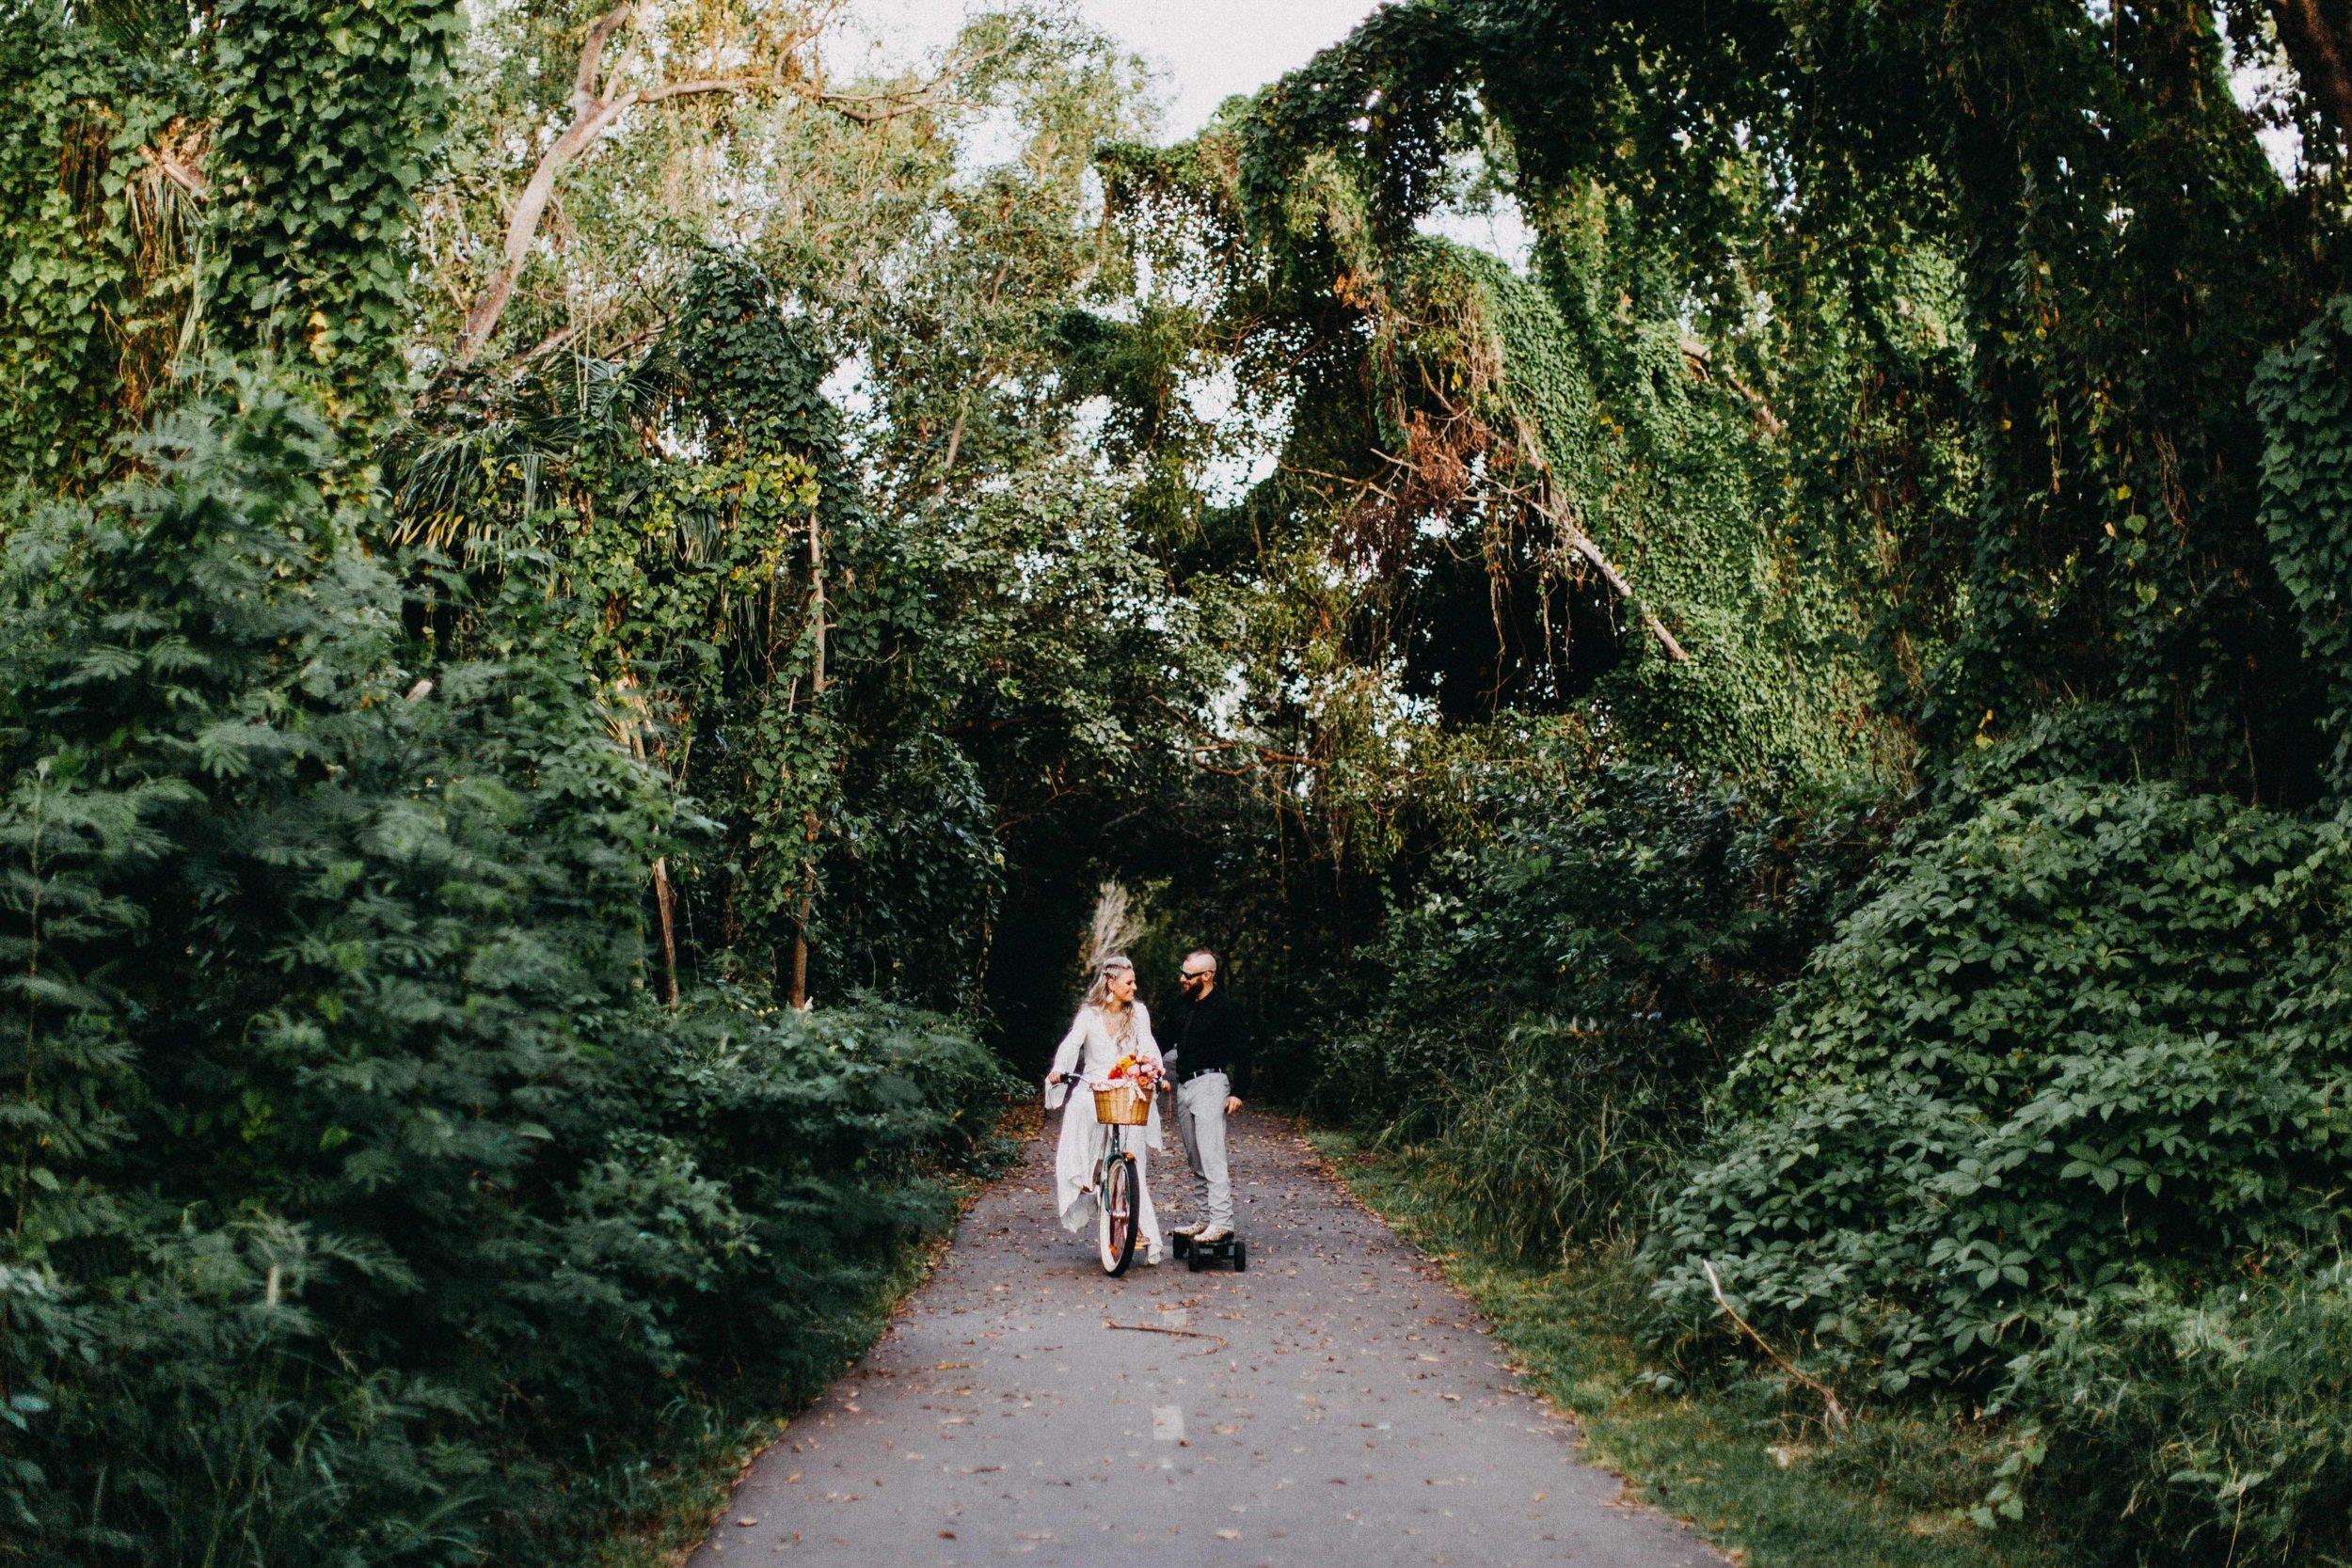 darwin-elopement-wedding-beach-camden-photography-www.emilyobrienphotography.net-47.jpg